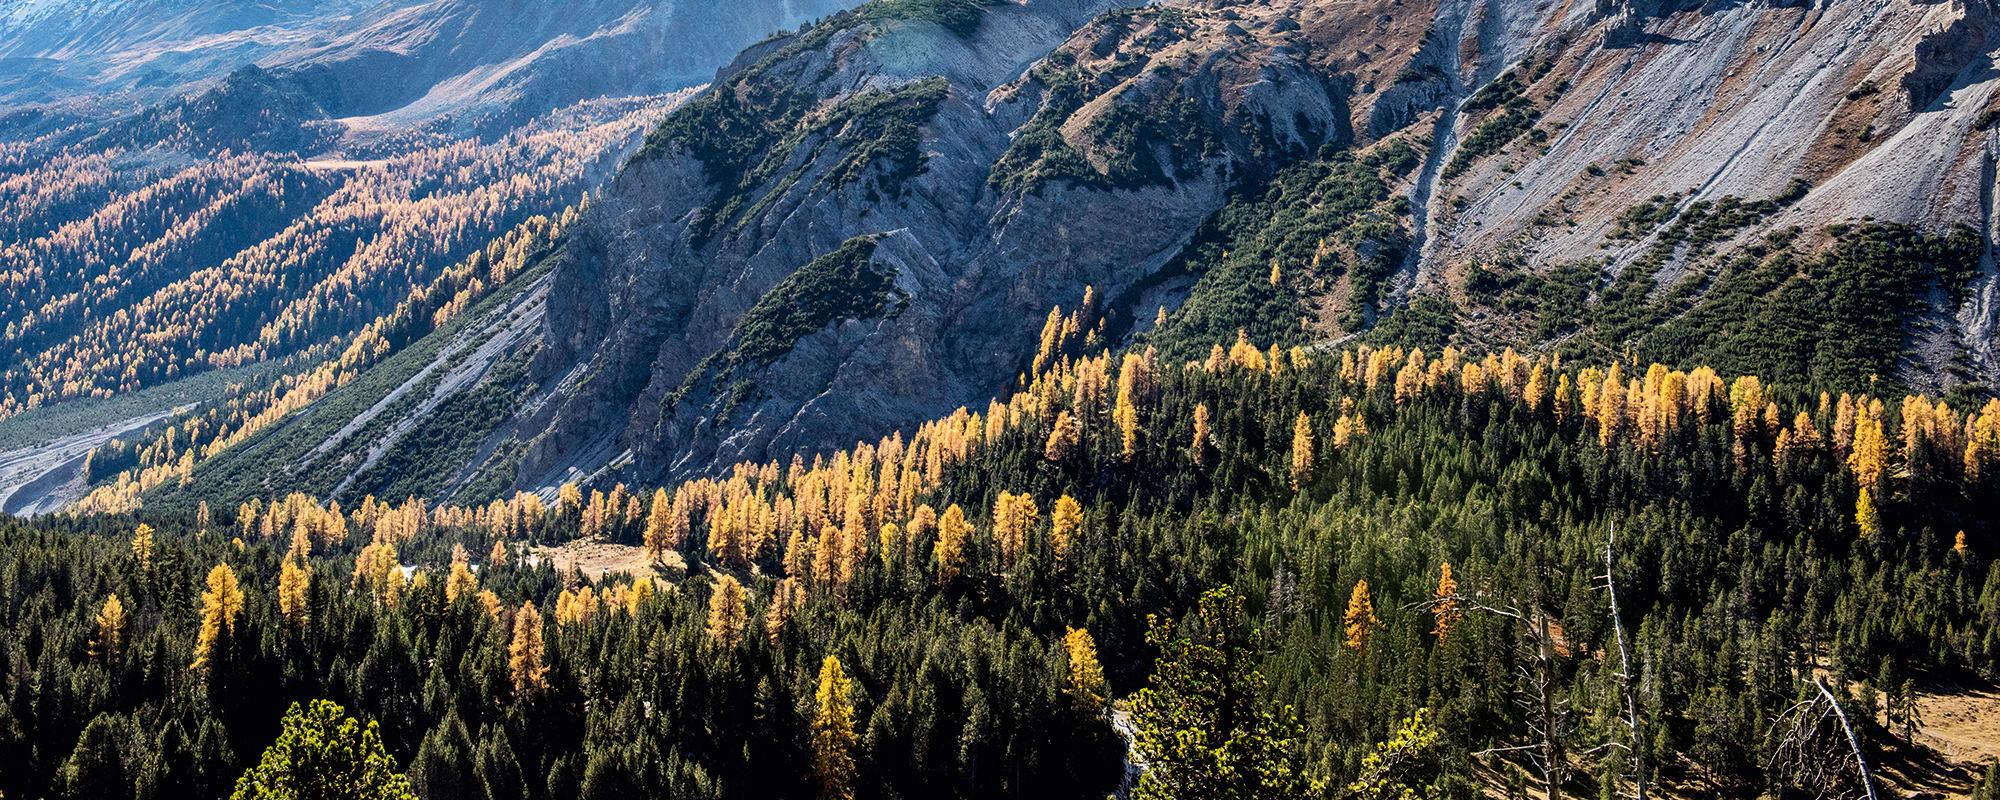 Arvenwald, Tamangur, Val S-charl